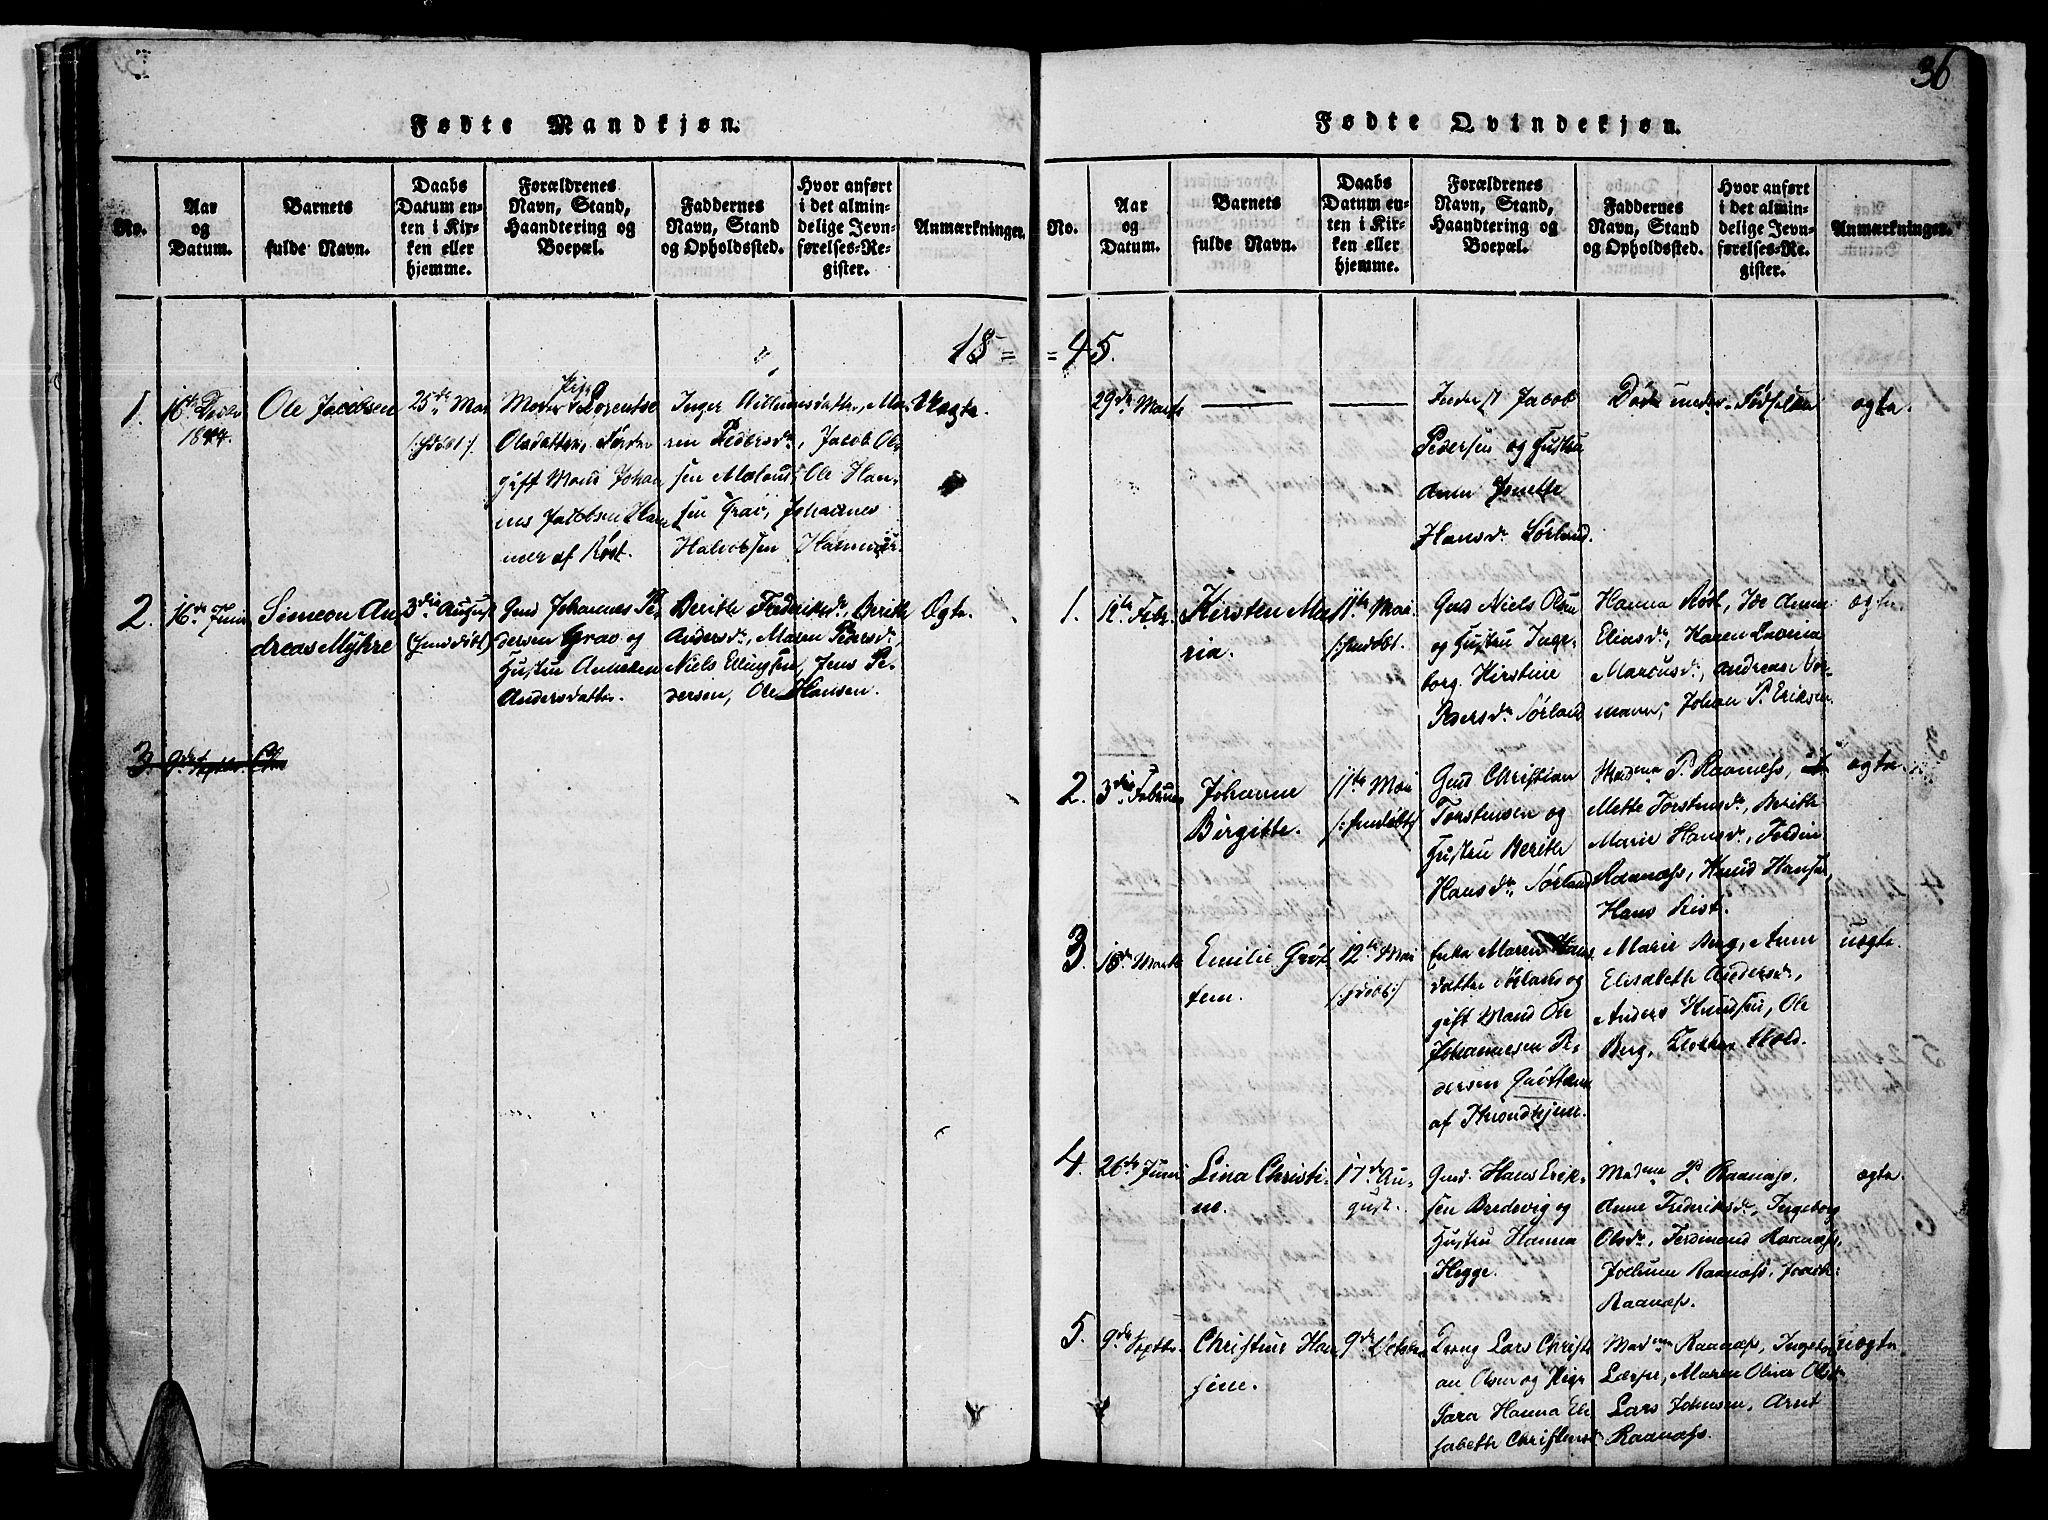 SAT, Ministerialprotokoller, klokkerbøker og fødselsregistre - Nordland, 807/L0120: Ministerialbok nr. 807A03, 1821-1848, s. 36